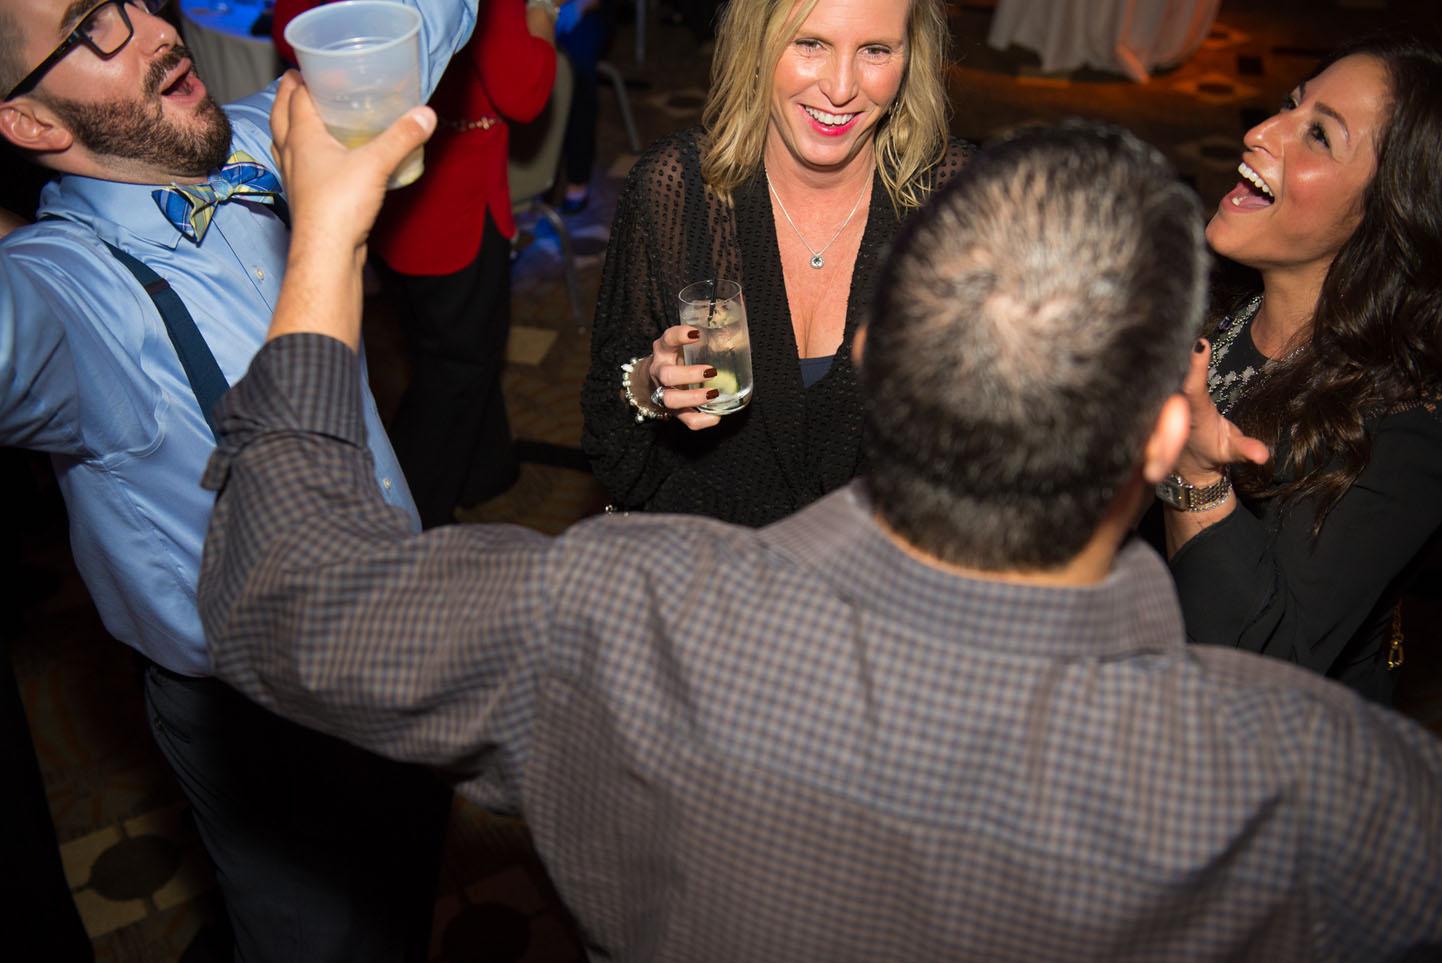 2015-12-09 ReMax Corpoarte Event - The Borgata - Atlantic City NJ - Photo Sesh - 2015-5141.jpg